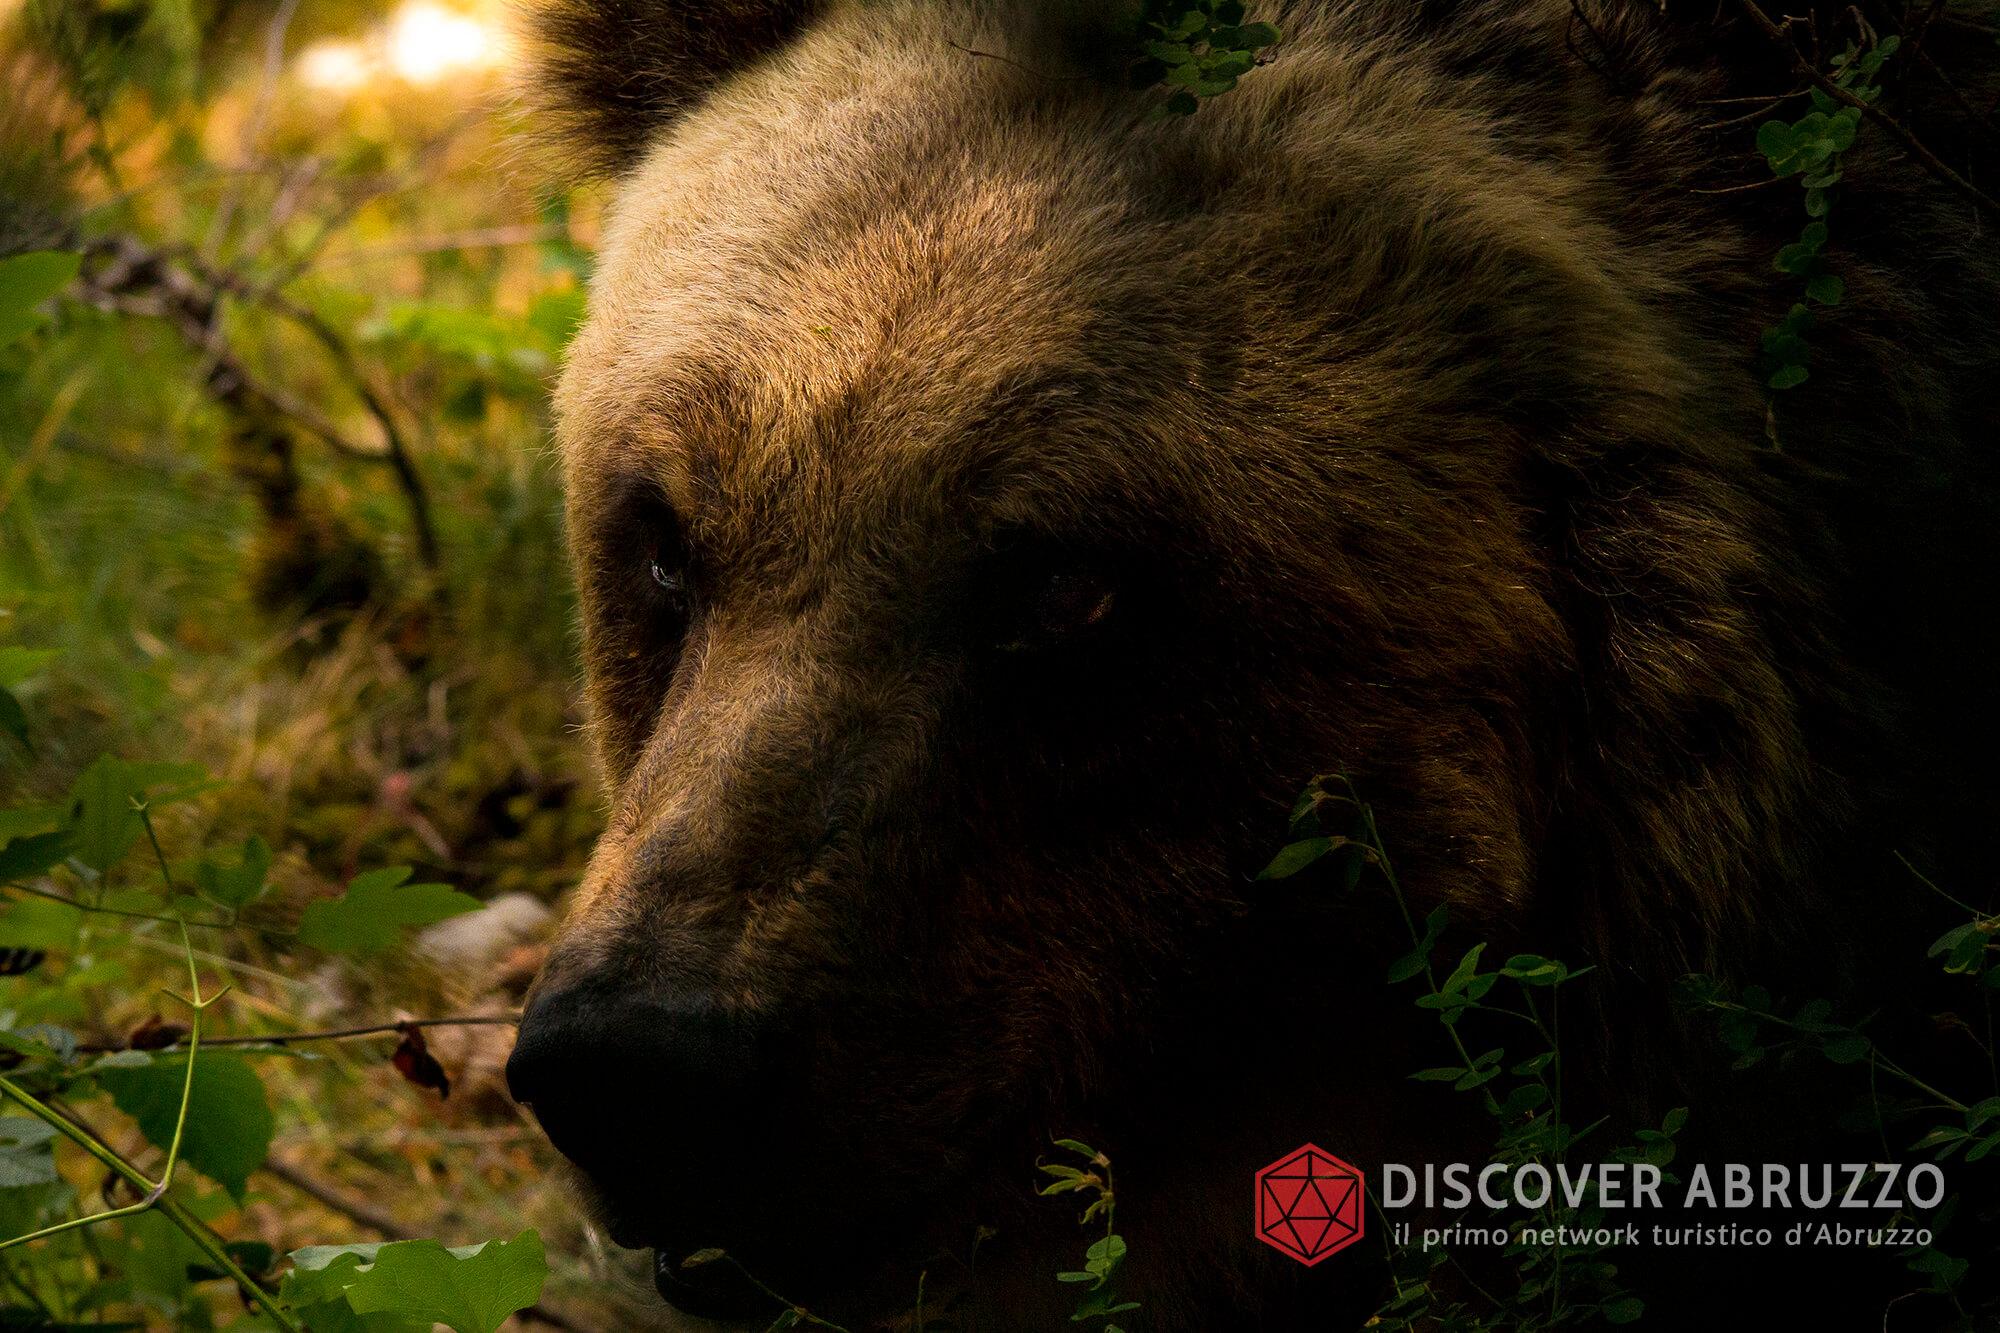 Wildlife Orsomarsicano Discover Abruzzo Nature Ours 1